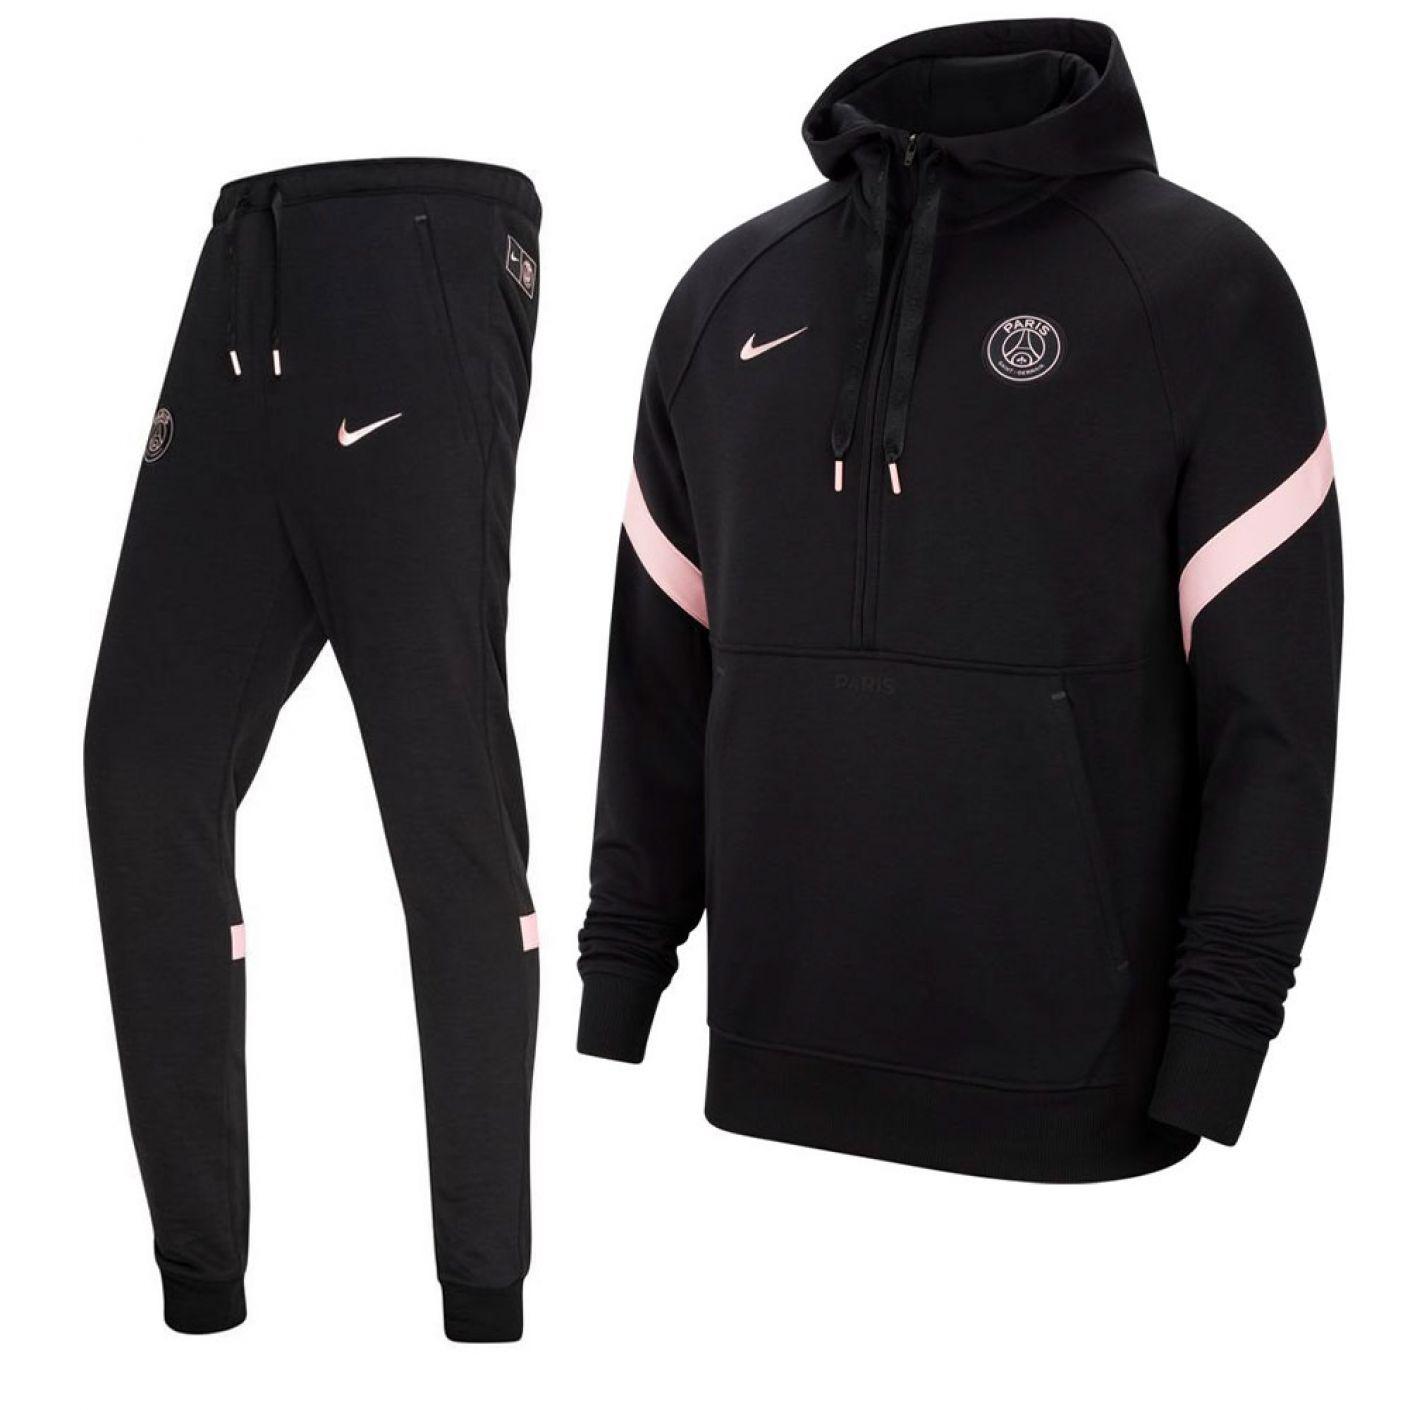 Nike Paris Saint Germain Travel Fleece Trainingspak 2021-2022 Zwart Roze